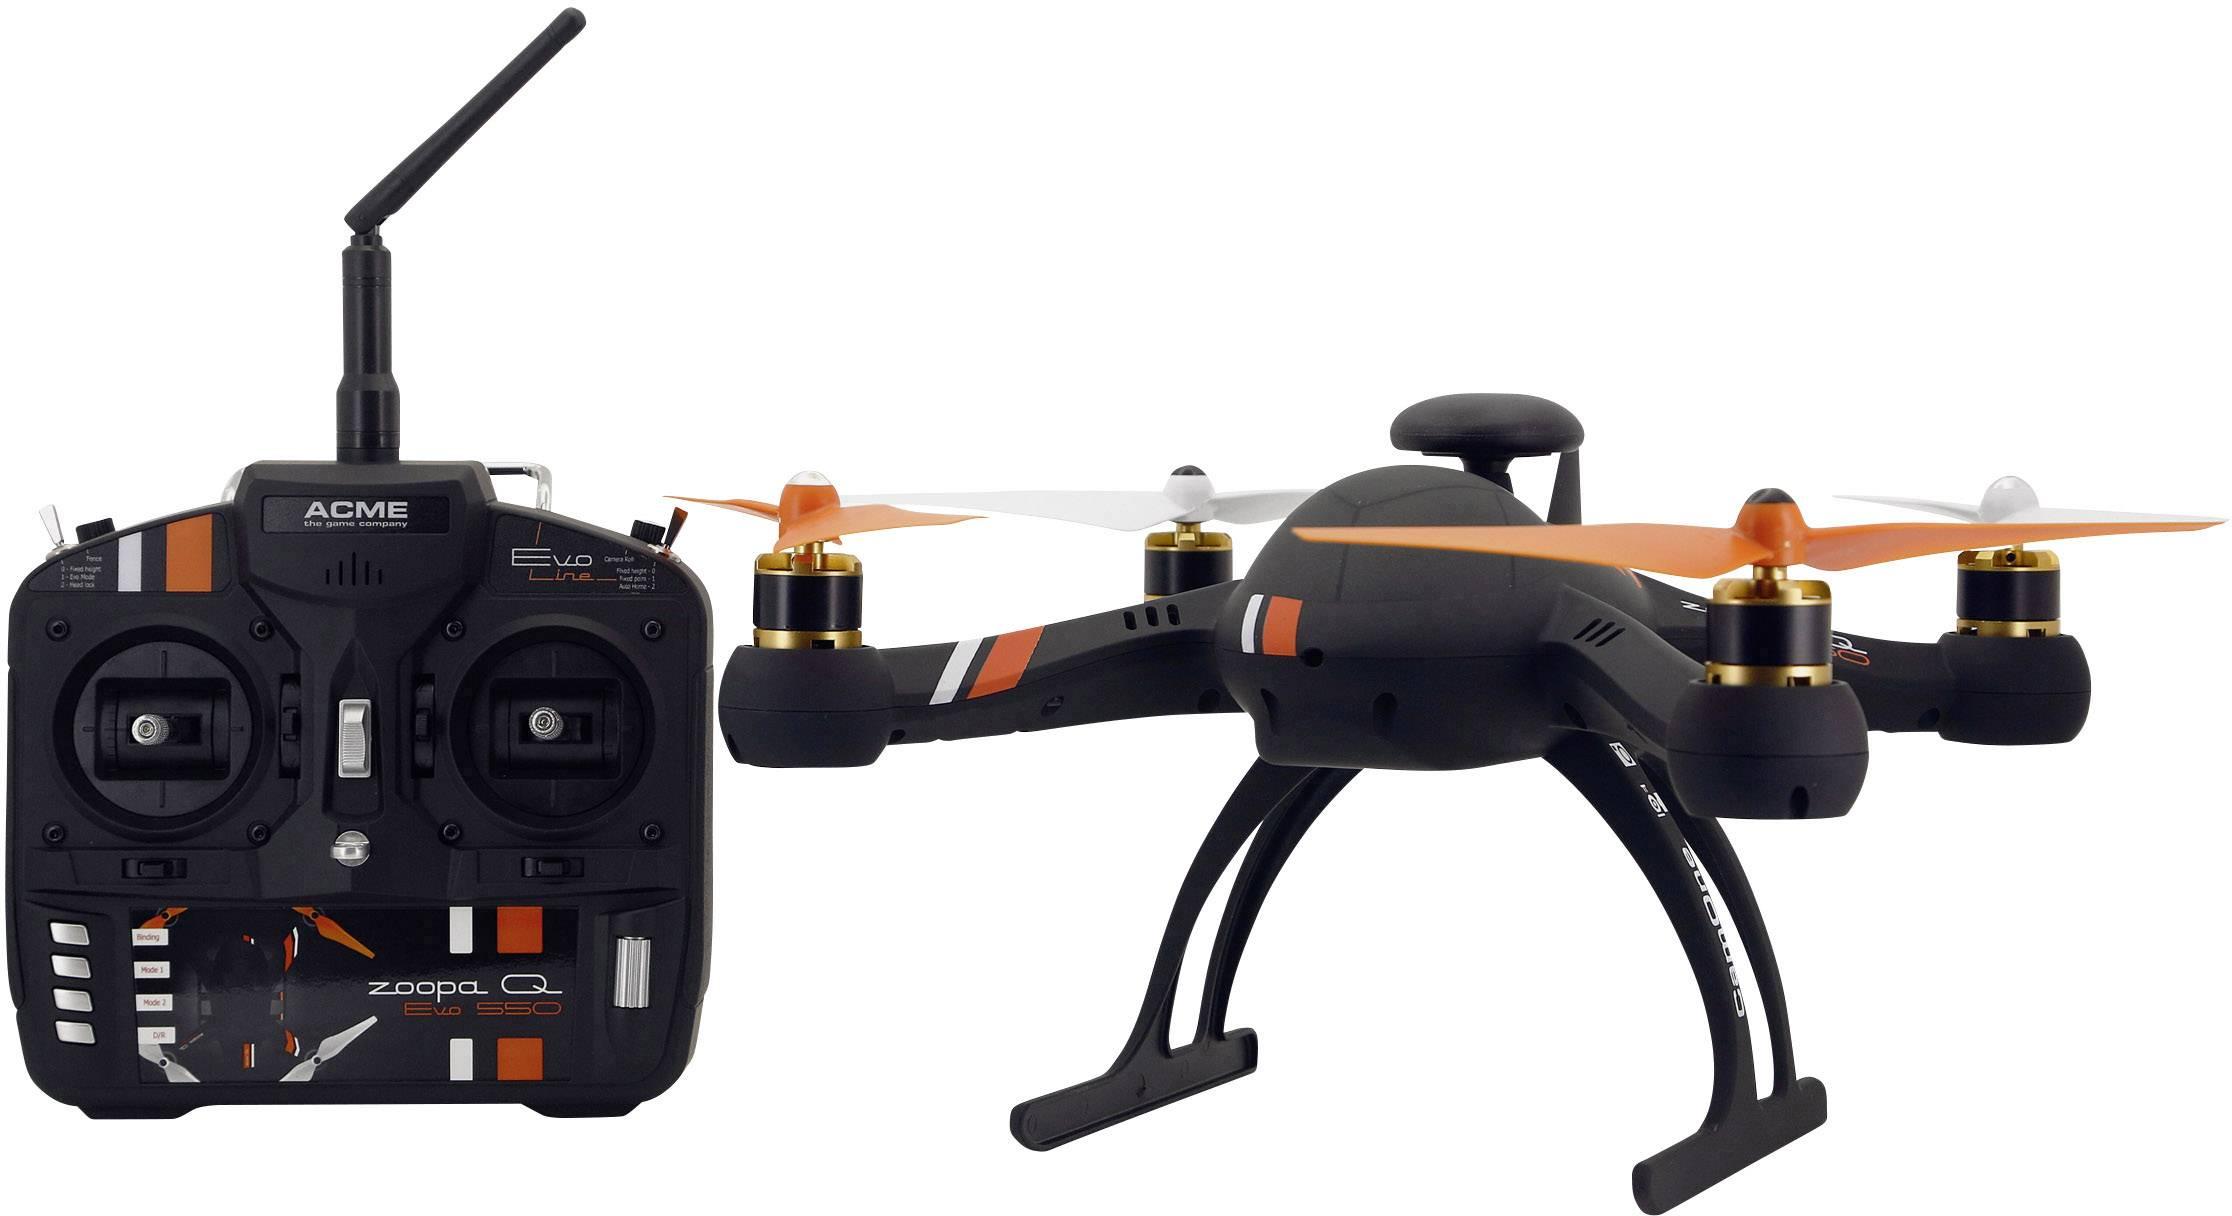 Dron ACME zoopa Q Evo 550 RtF